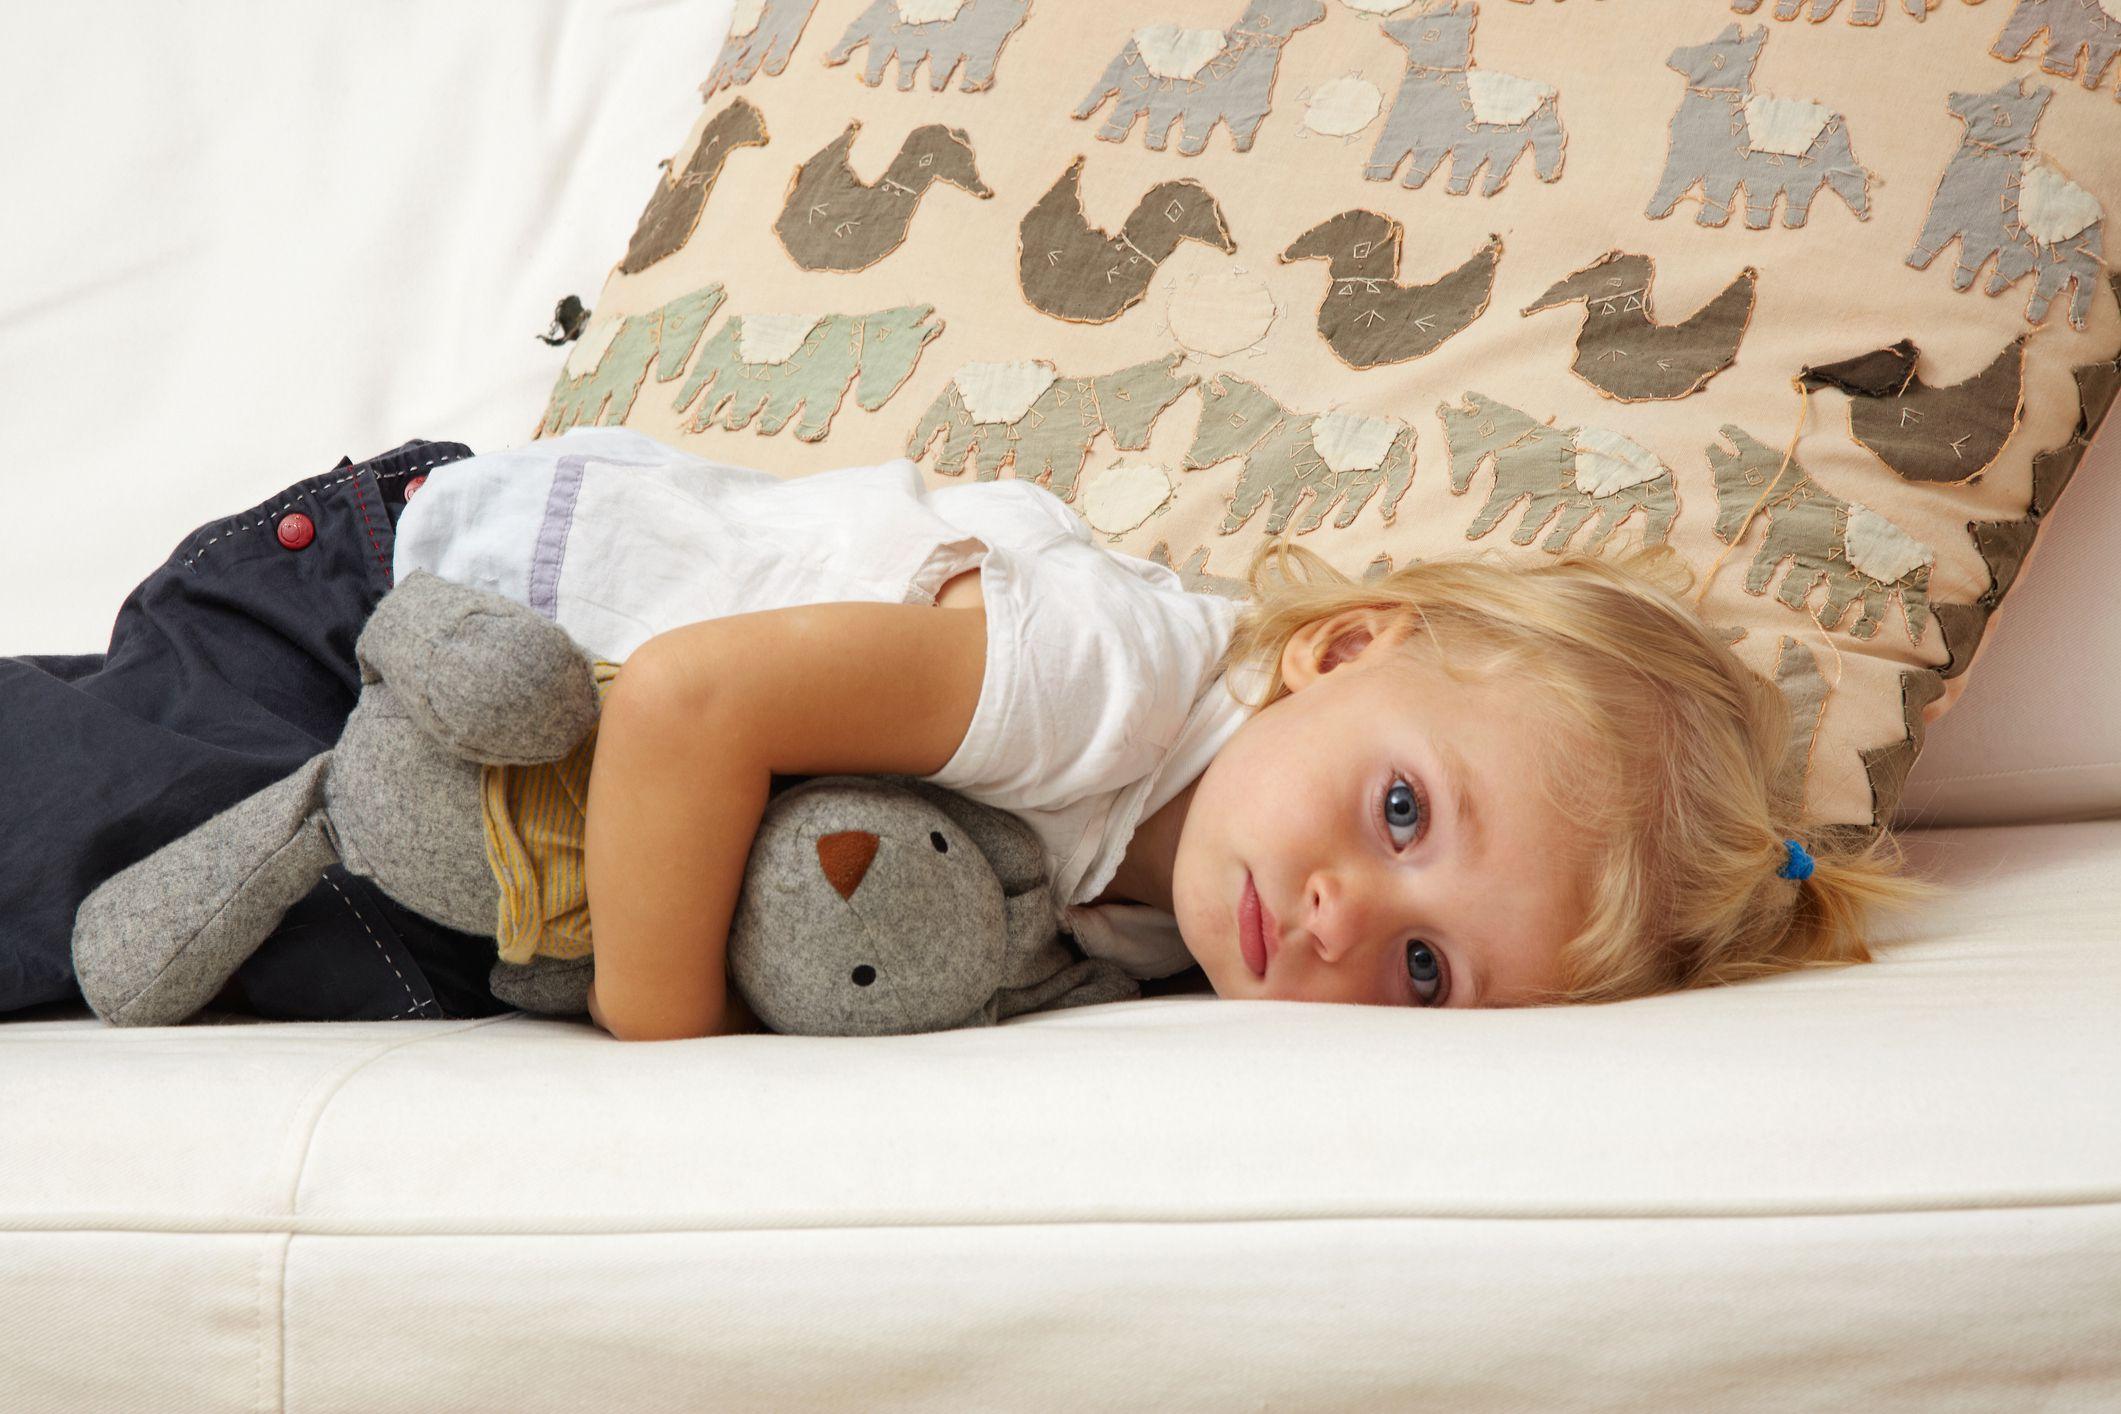 Study Links Toddler Behavior Problems to Celiac Disease